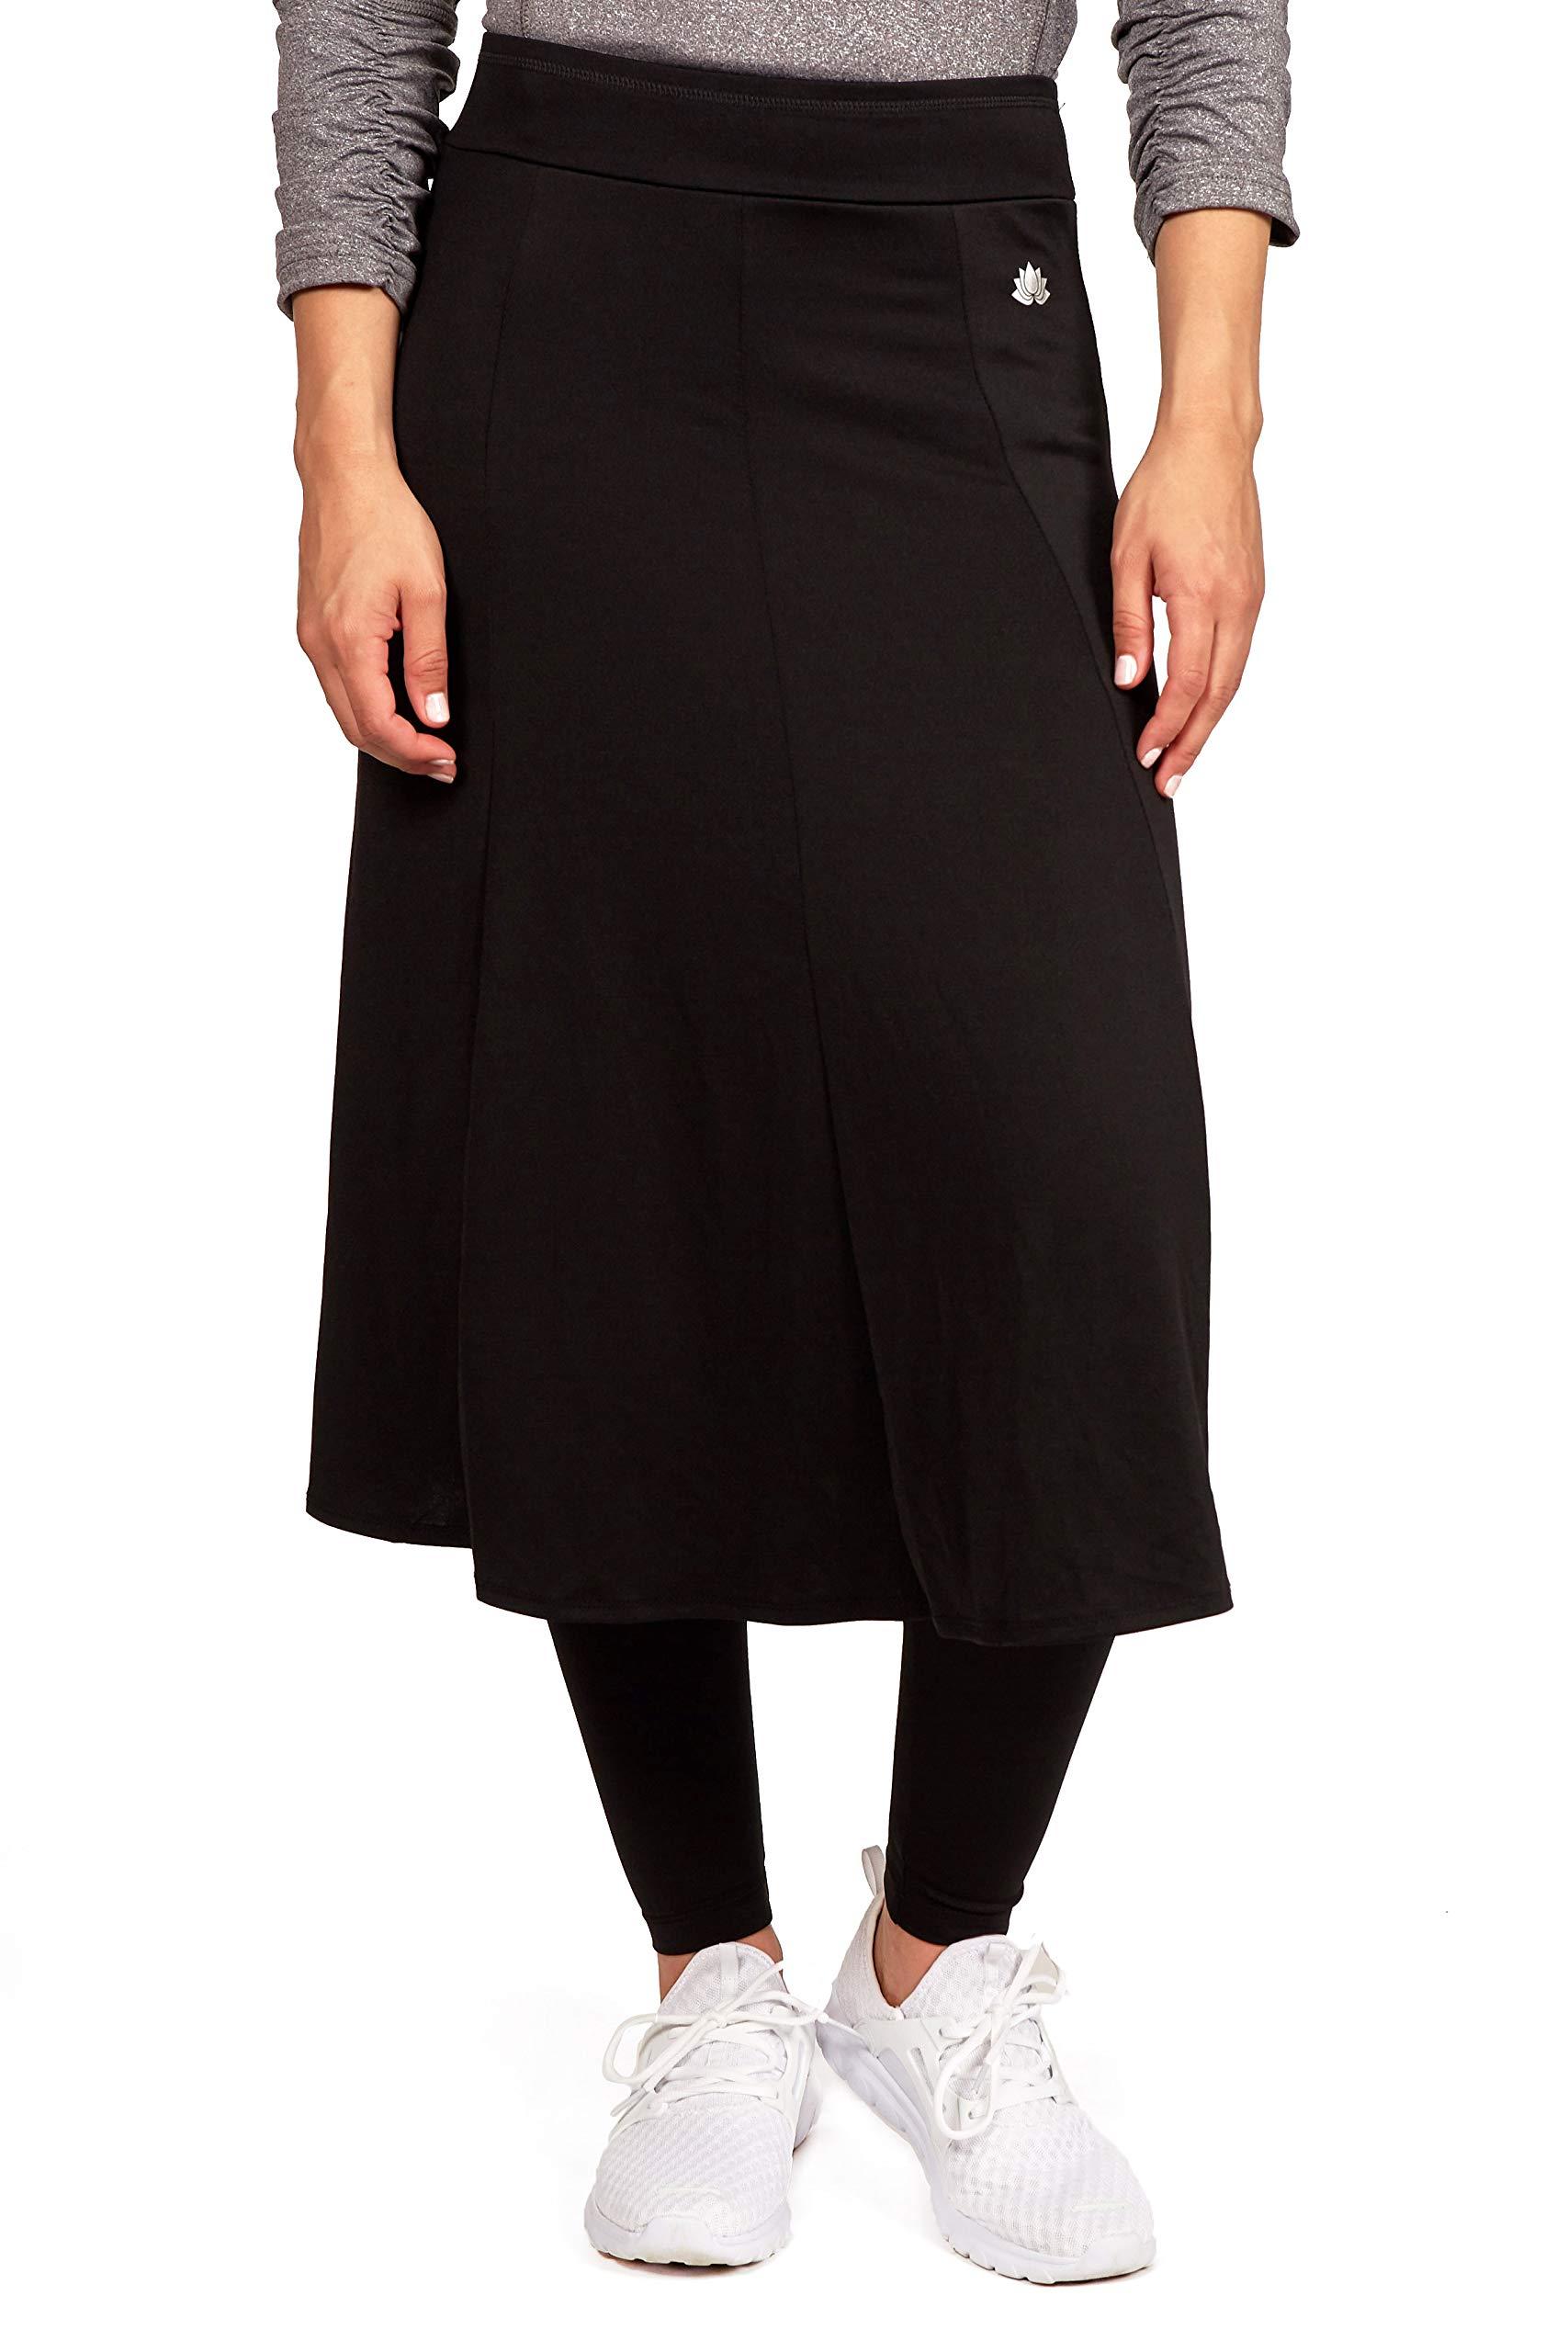 Modesty Athleisure Snoga Long Twirly Skirt w/Attached Leggings - Black, XS